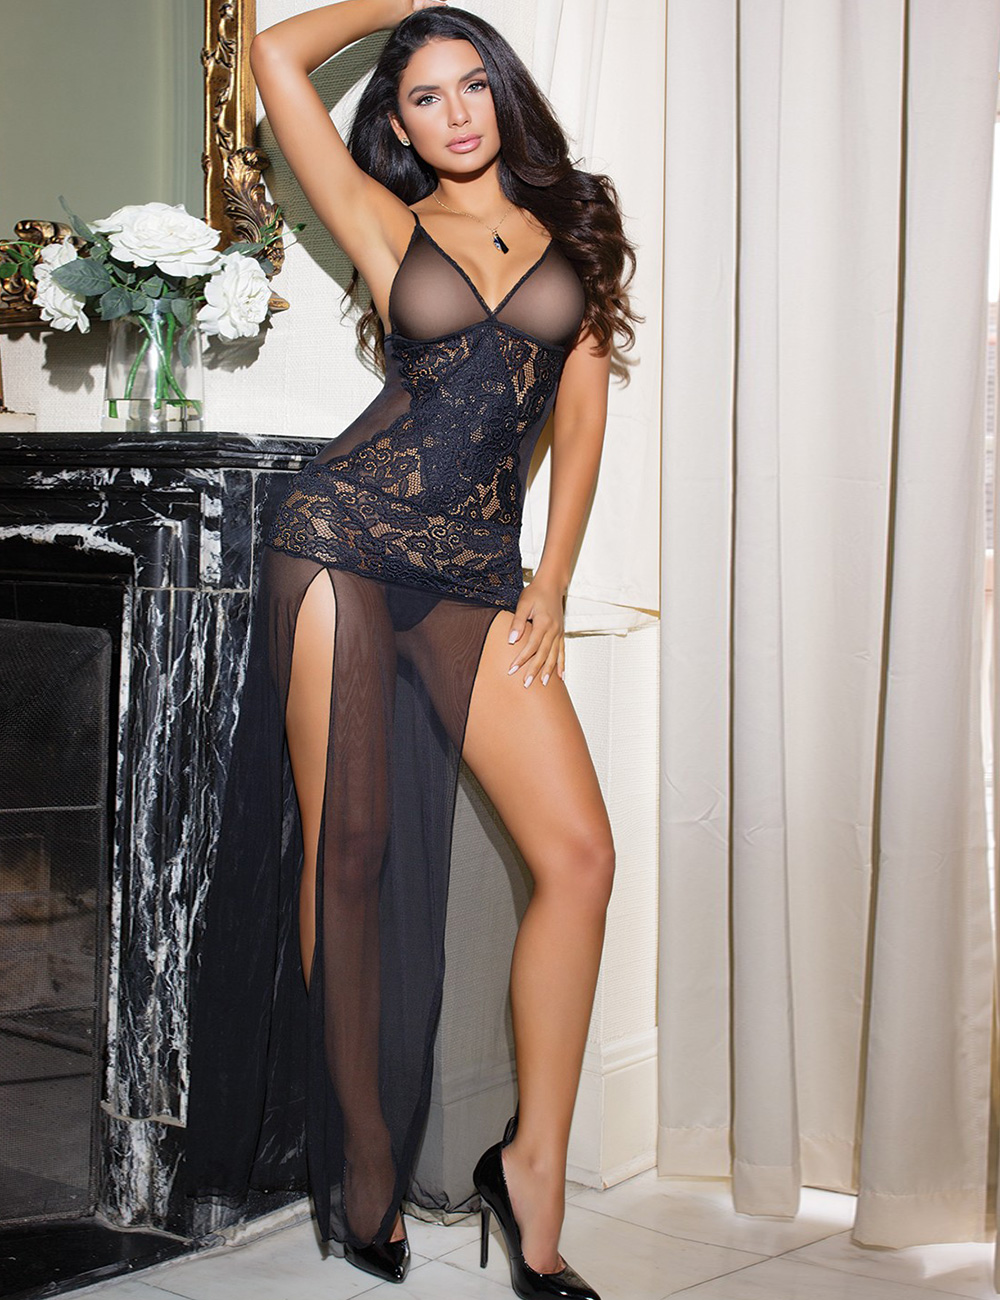 Cheap Black Mesh And Lace Elegant Lingerie Gown